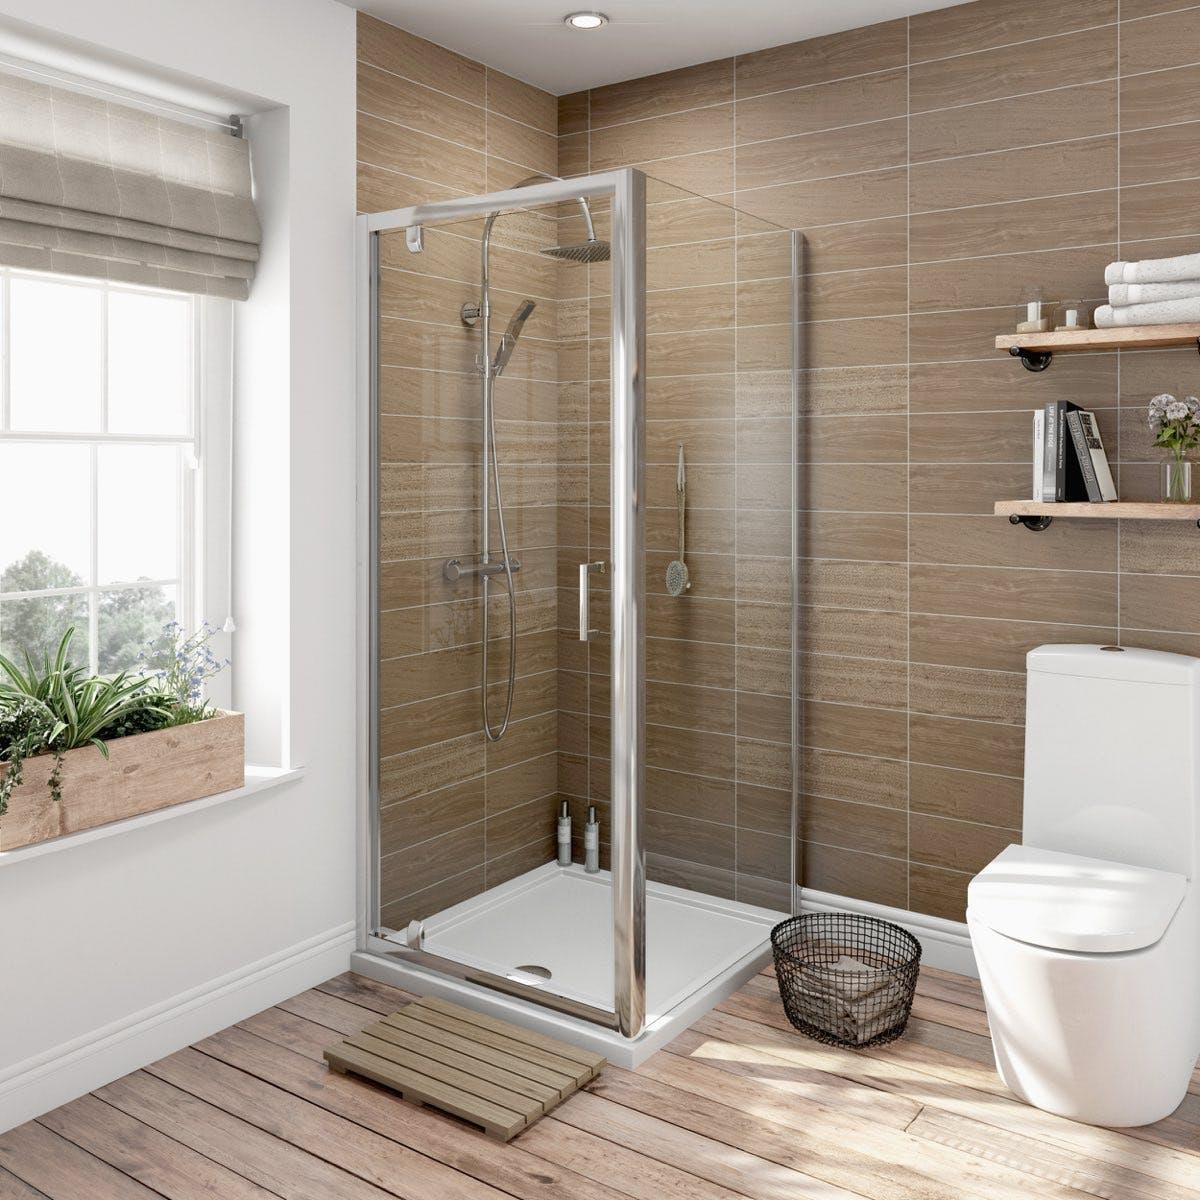 6mm Pivot Door Rectangular Shower Enclosure Offer Pack